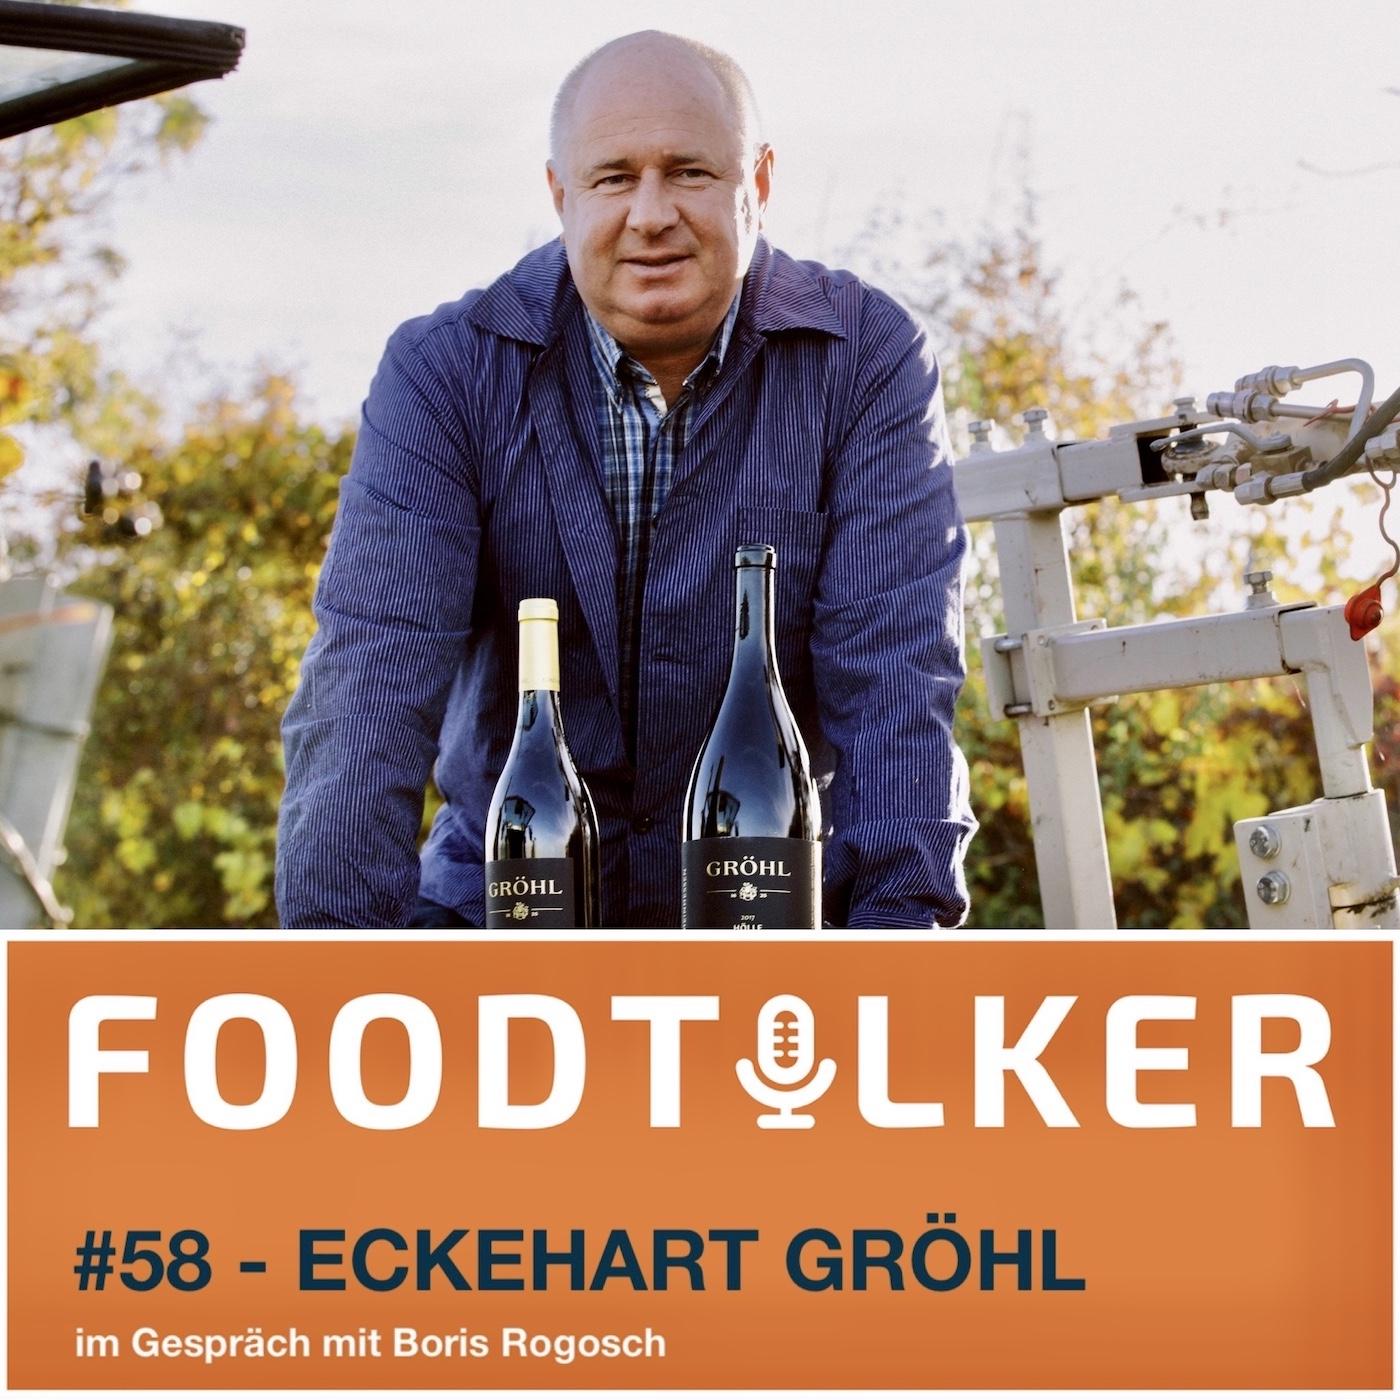 Eckehart Gröhl - Winzer